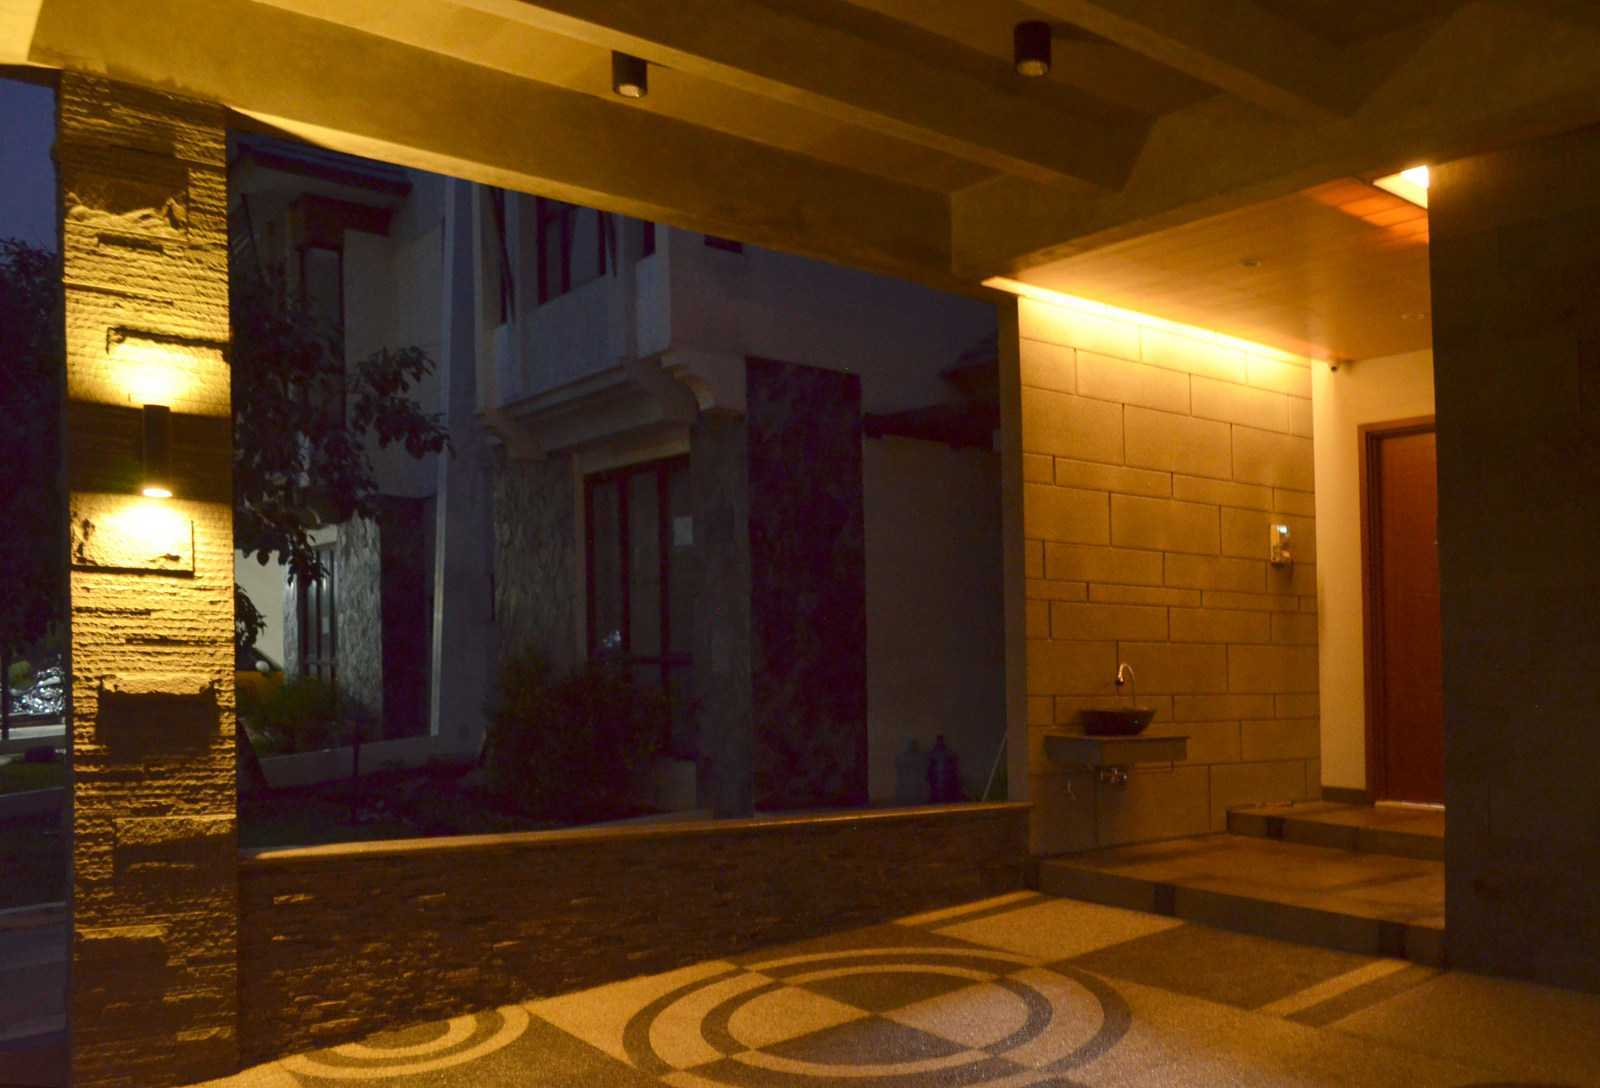 X3M Architects Nittaya A3 15 House Bsd Bsd Dsc0904   25329